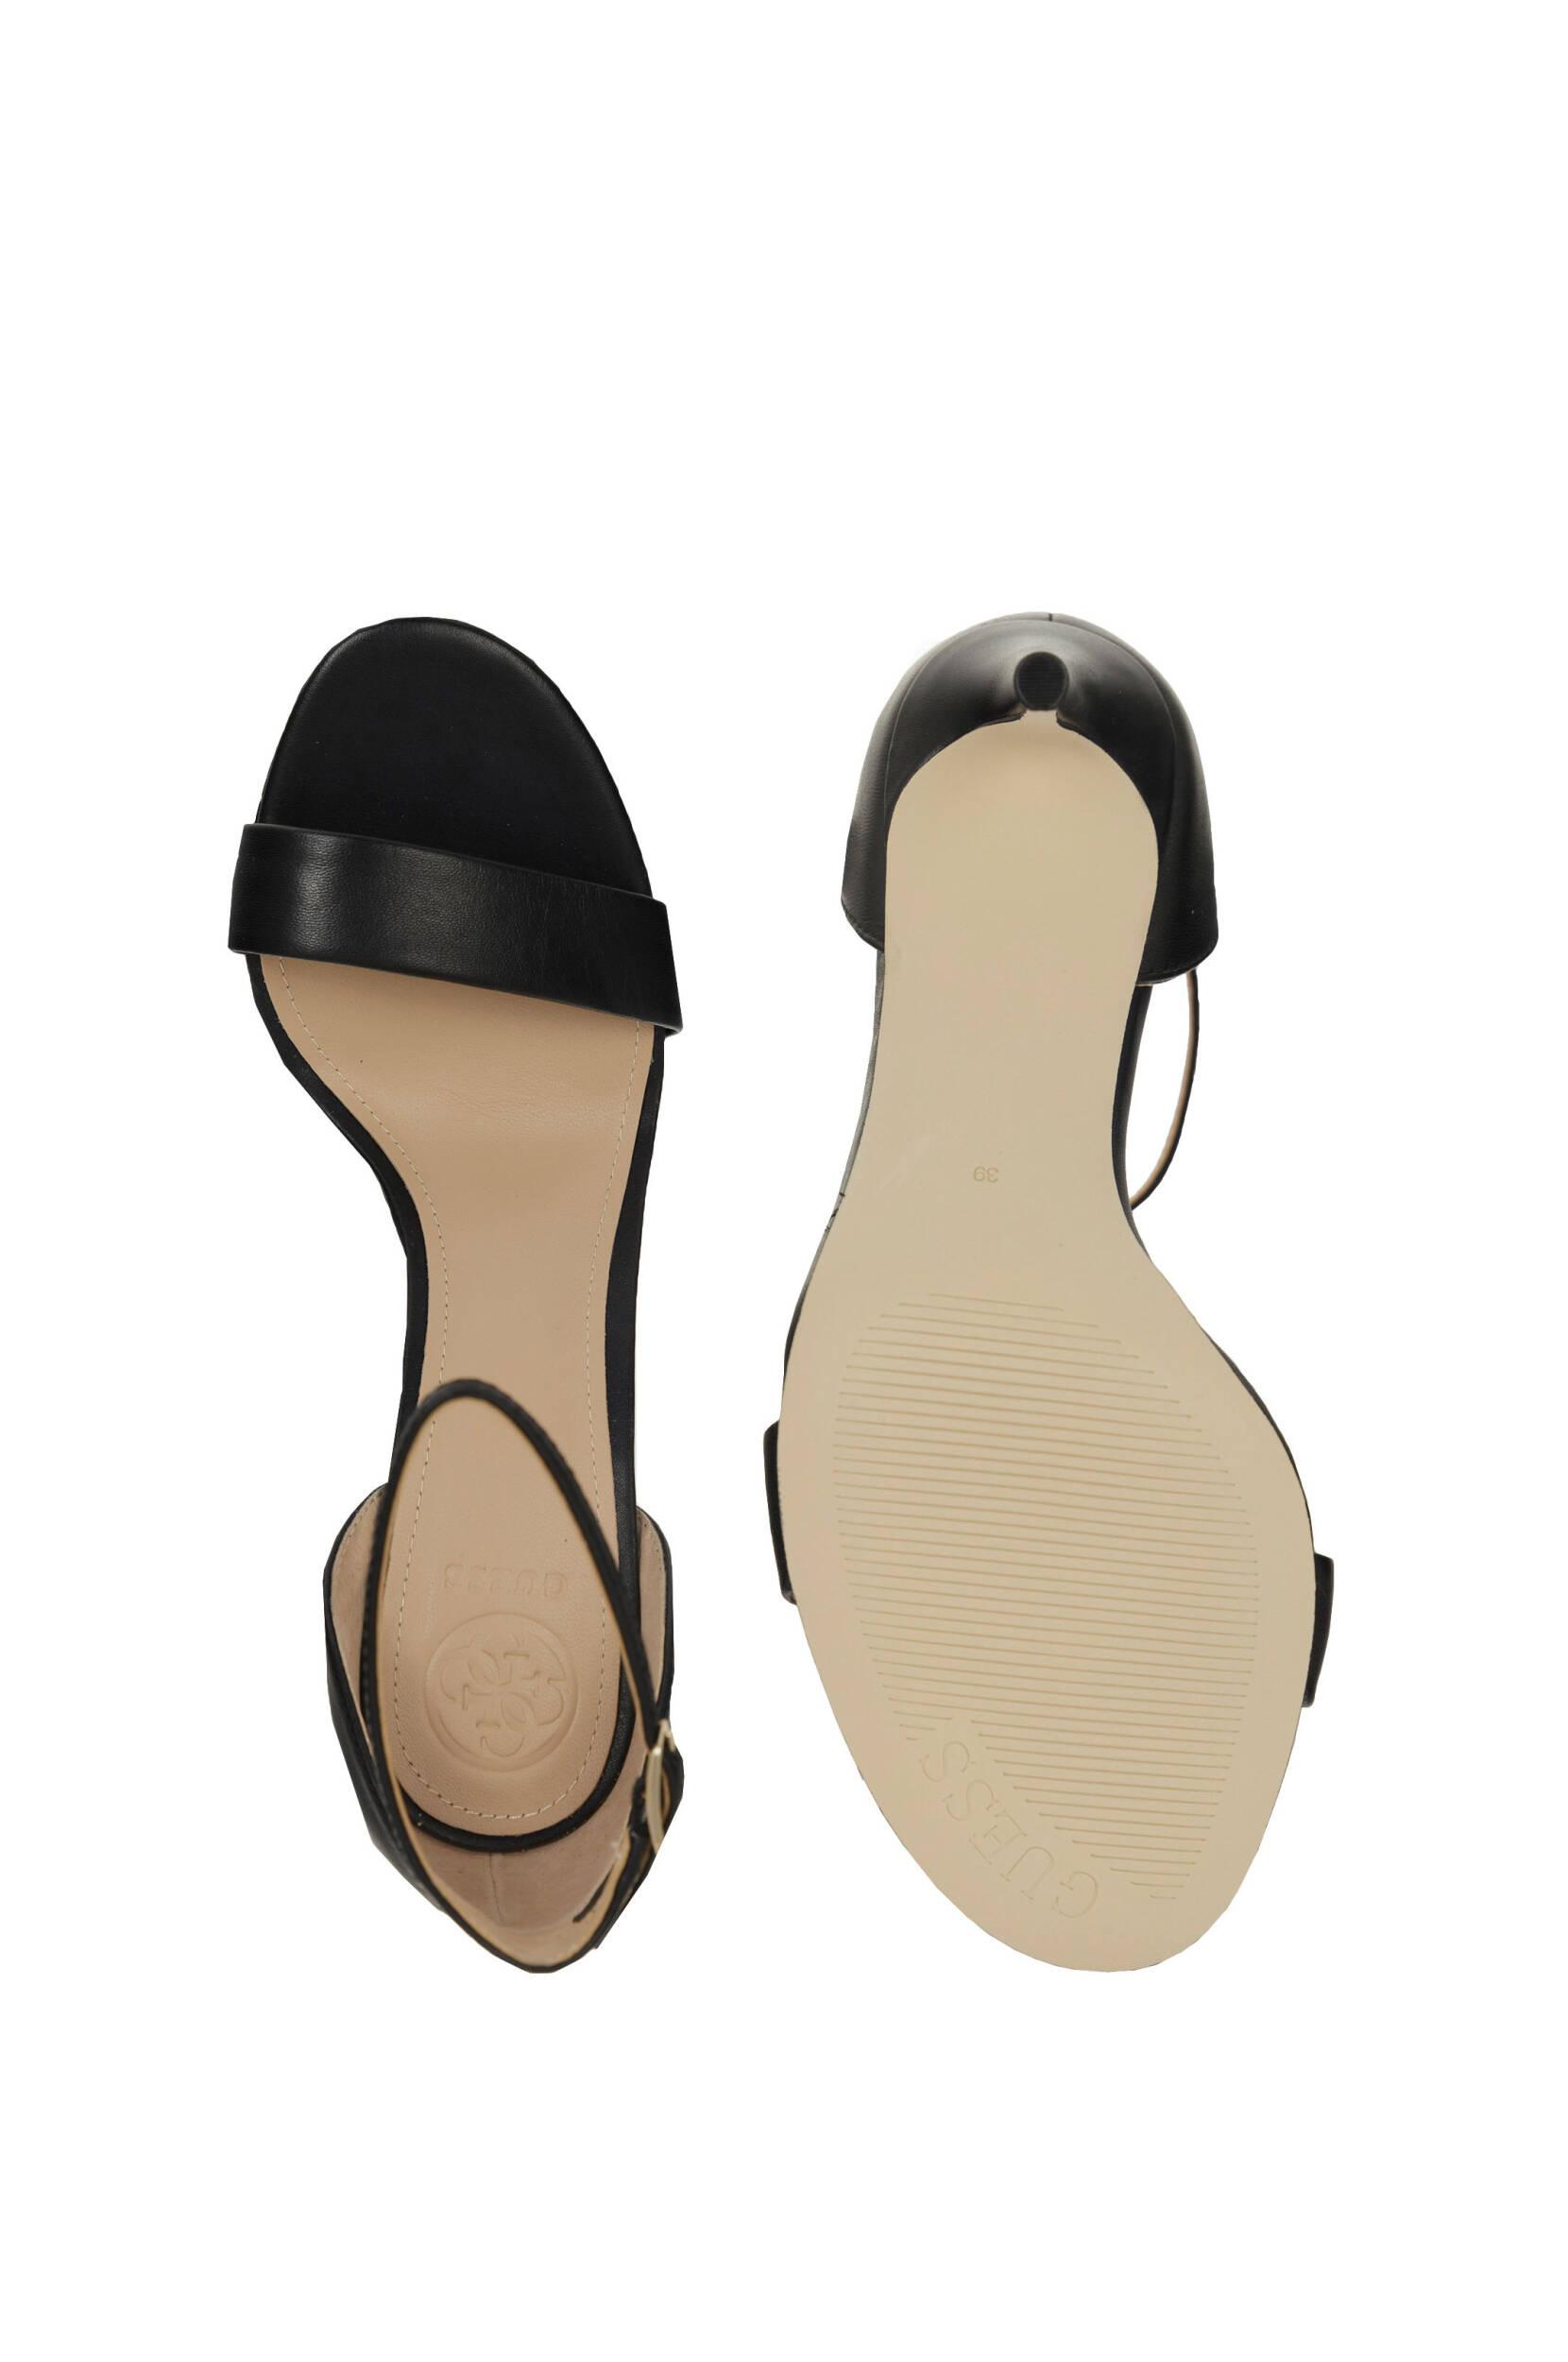 Karli 2 Karli High Heel Sandals Sandals Karli Heel 2 Heel 2 High High 3AR4jc5qL